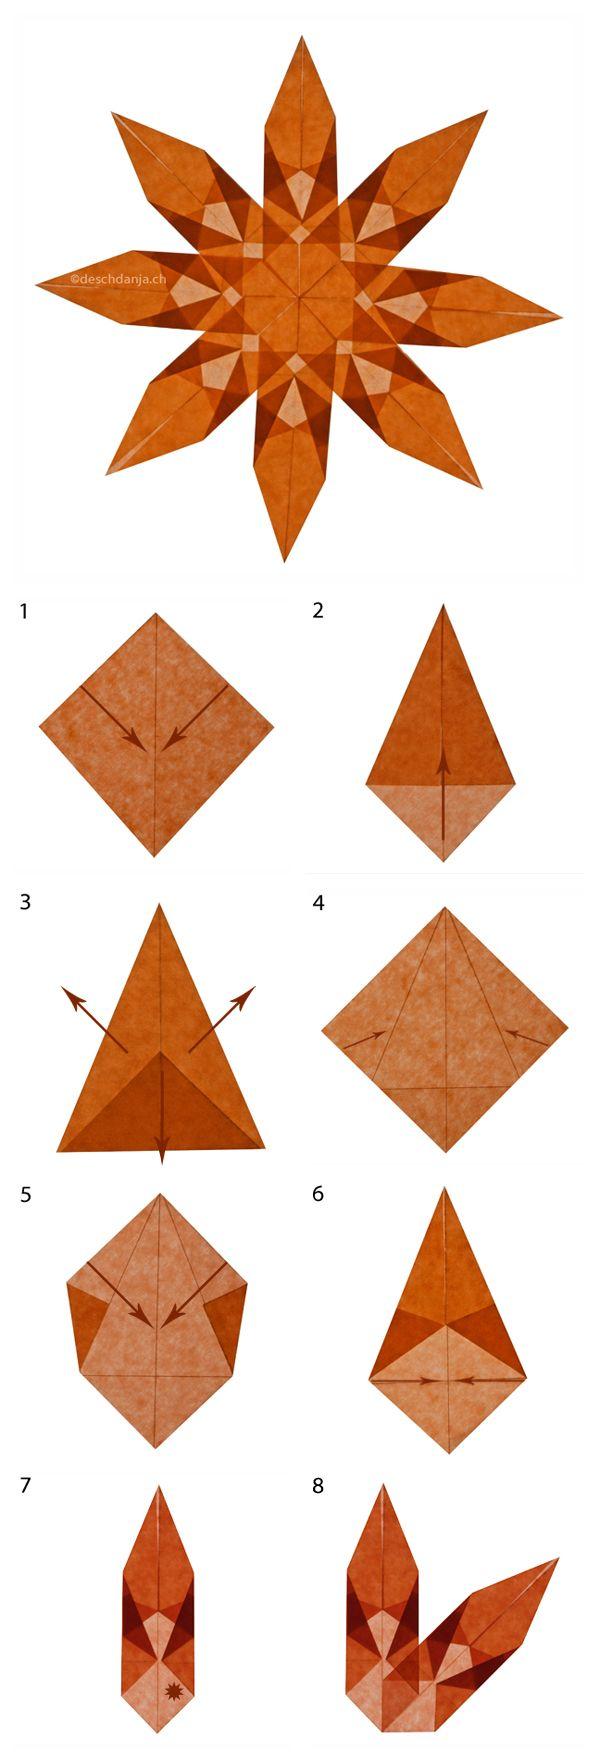 adventsbasteln leicht gemacht pinterest window star and origami. Black Bedroom Furniture Sets. Home Design Ideas